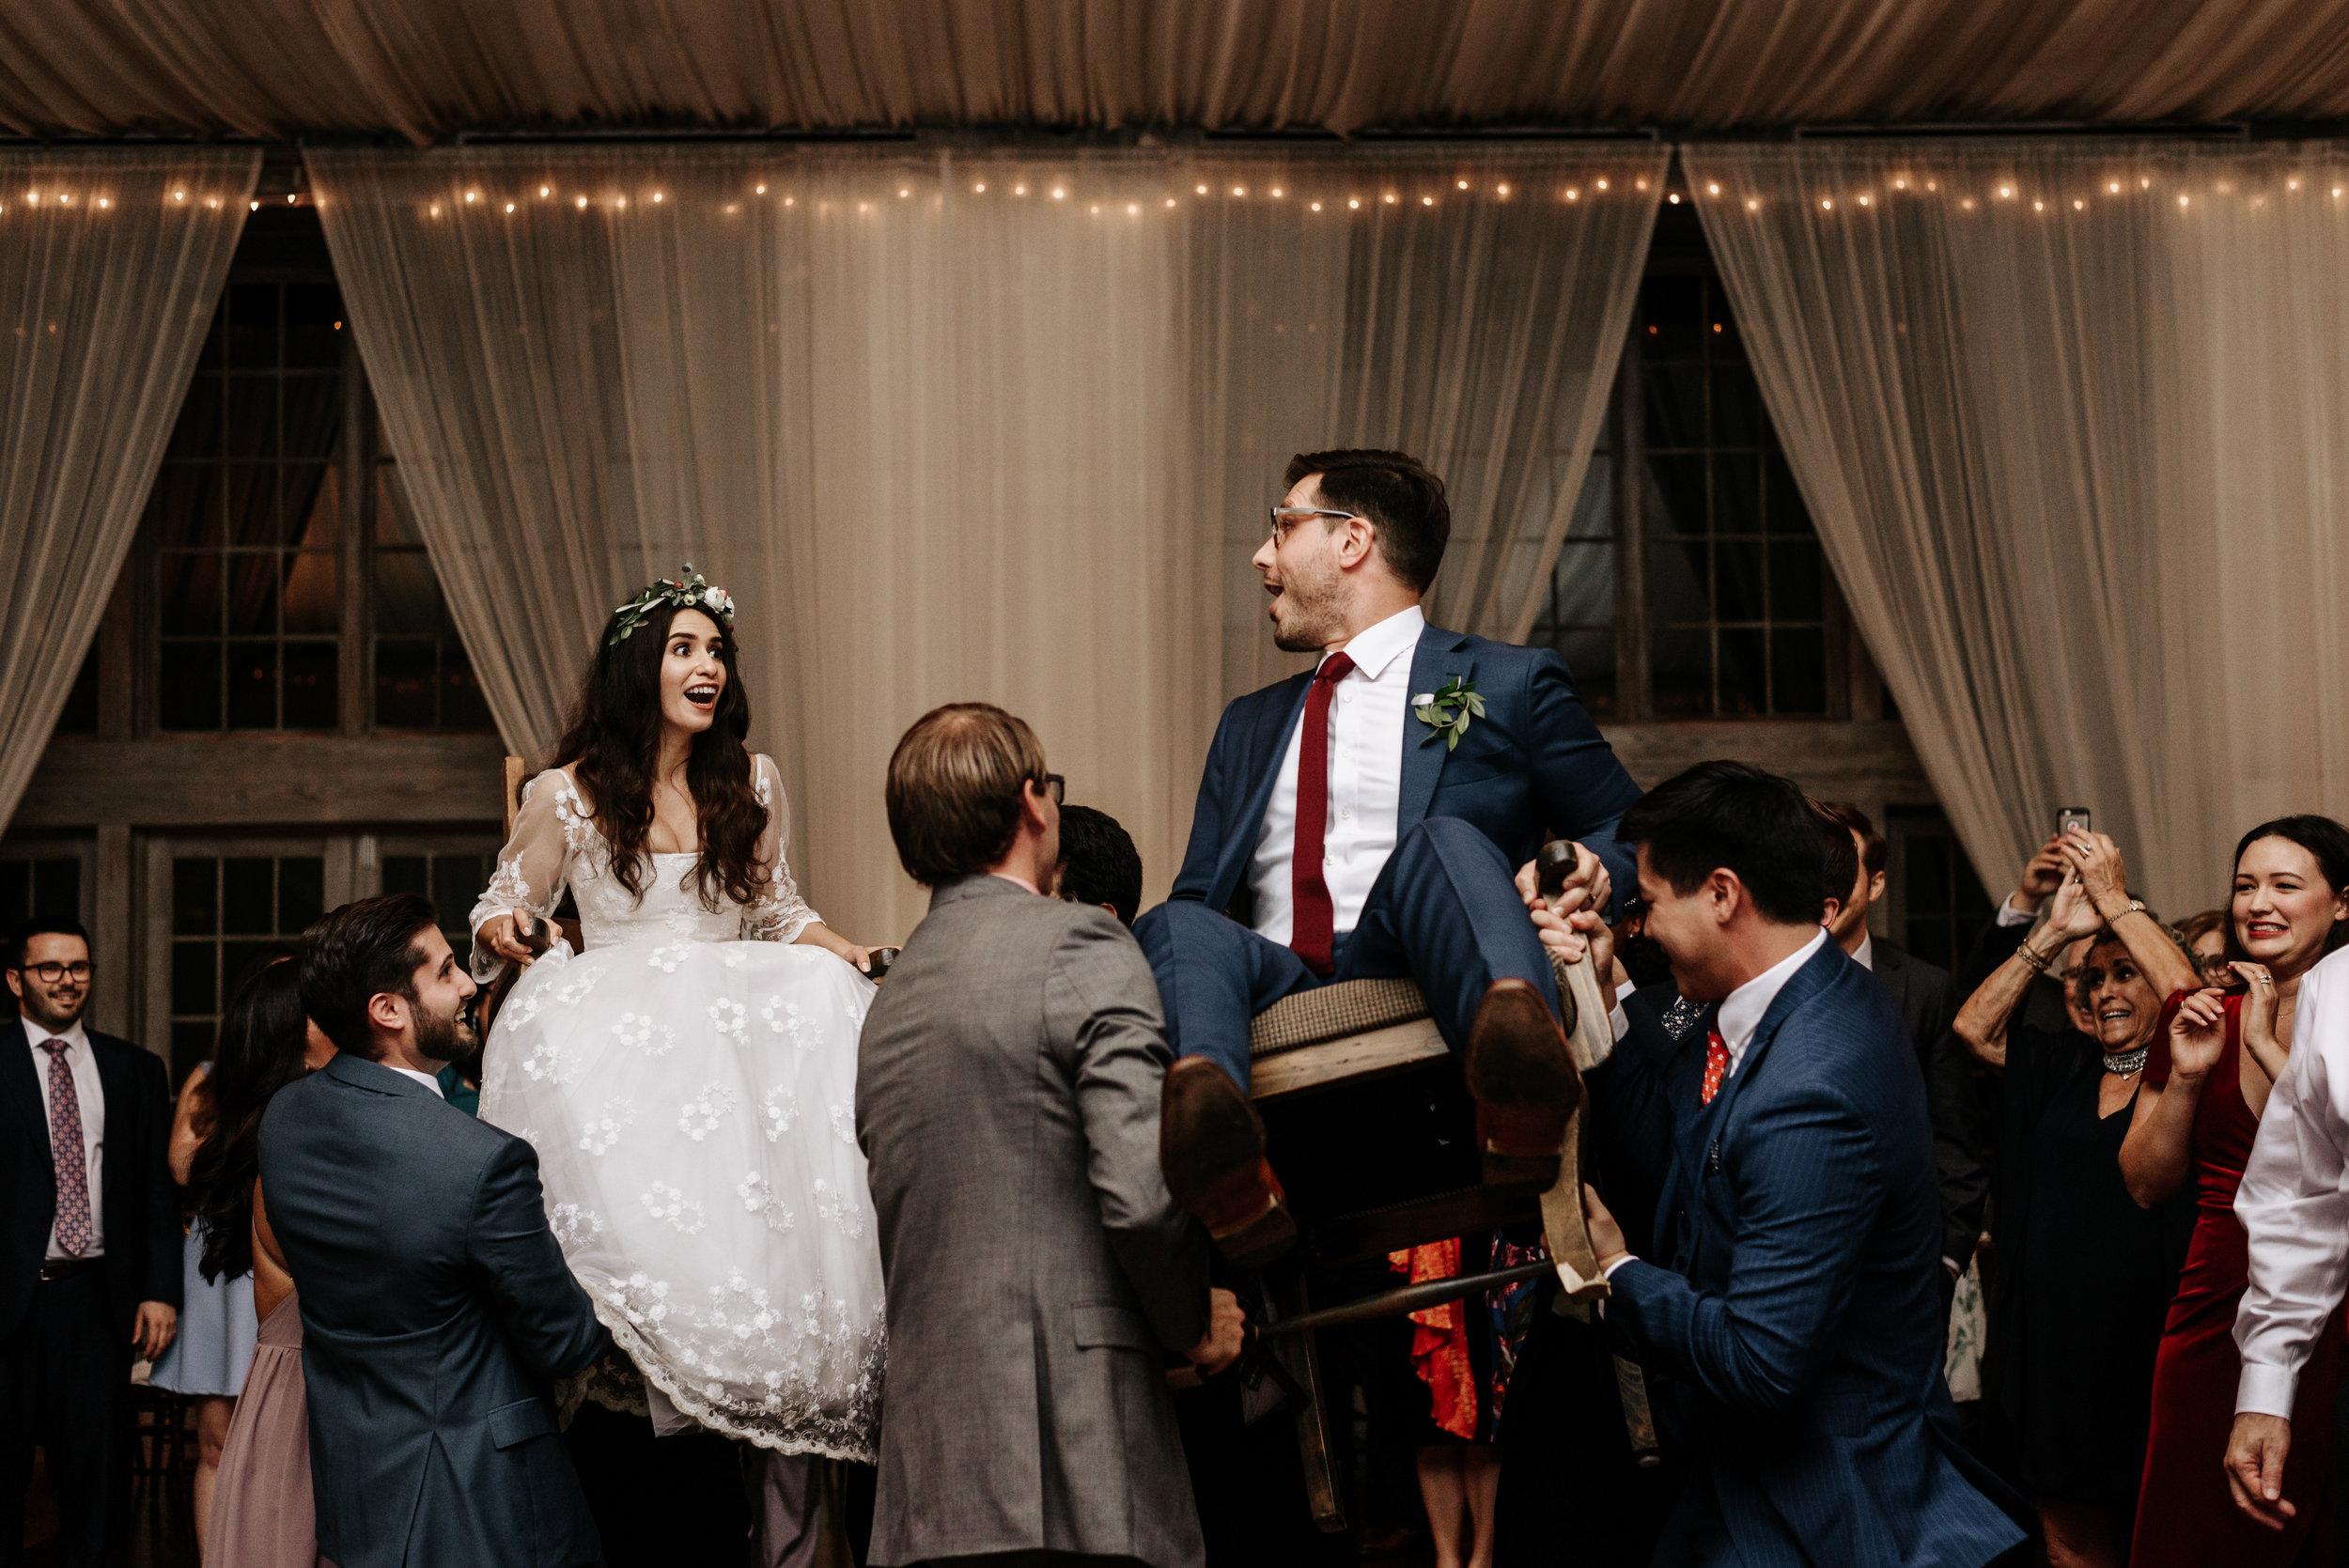 Veritas-Vineyards-and-Winery-Wedding-Photography-Afton-Virginia-Yasmin-Seth-Photography-by-V-3272.jpg